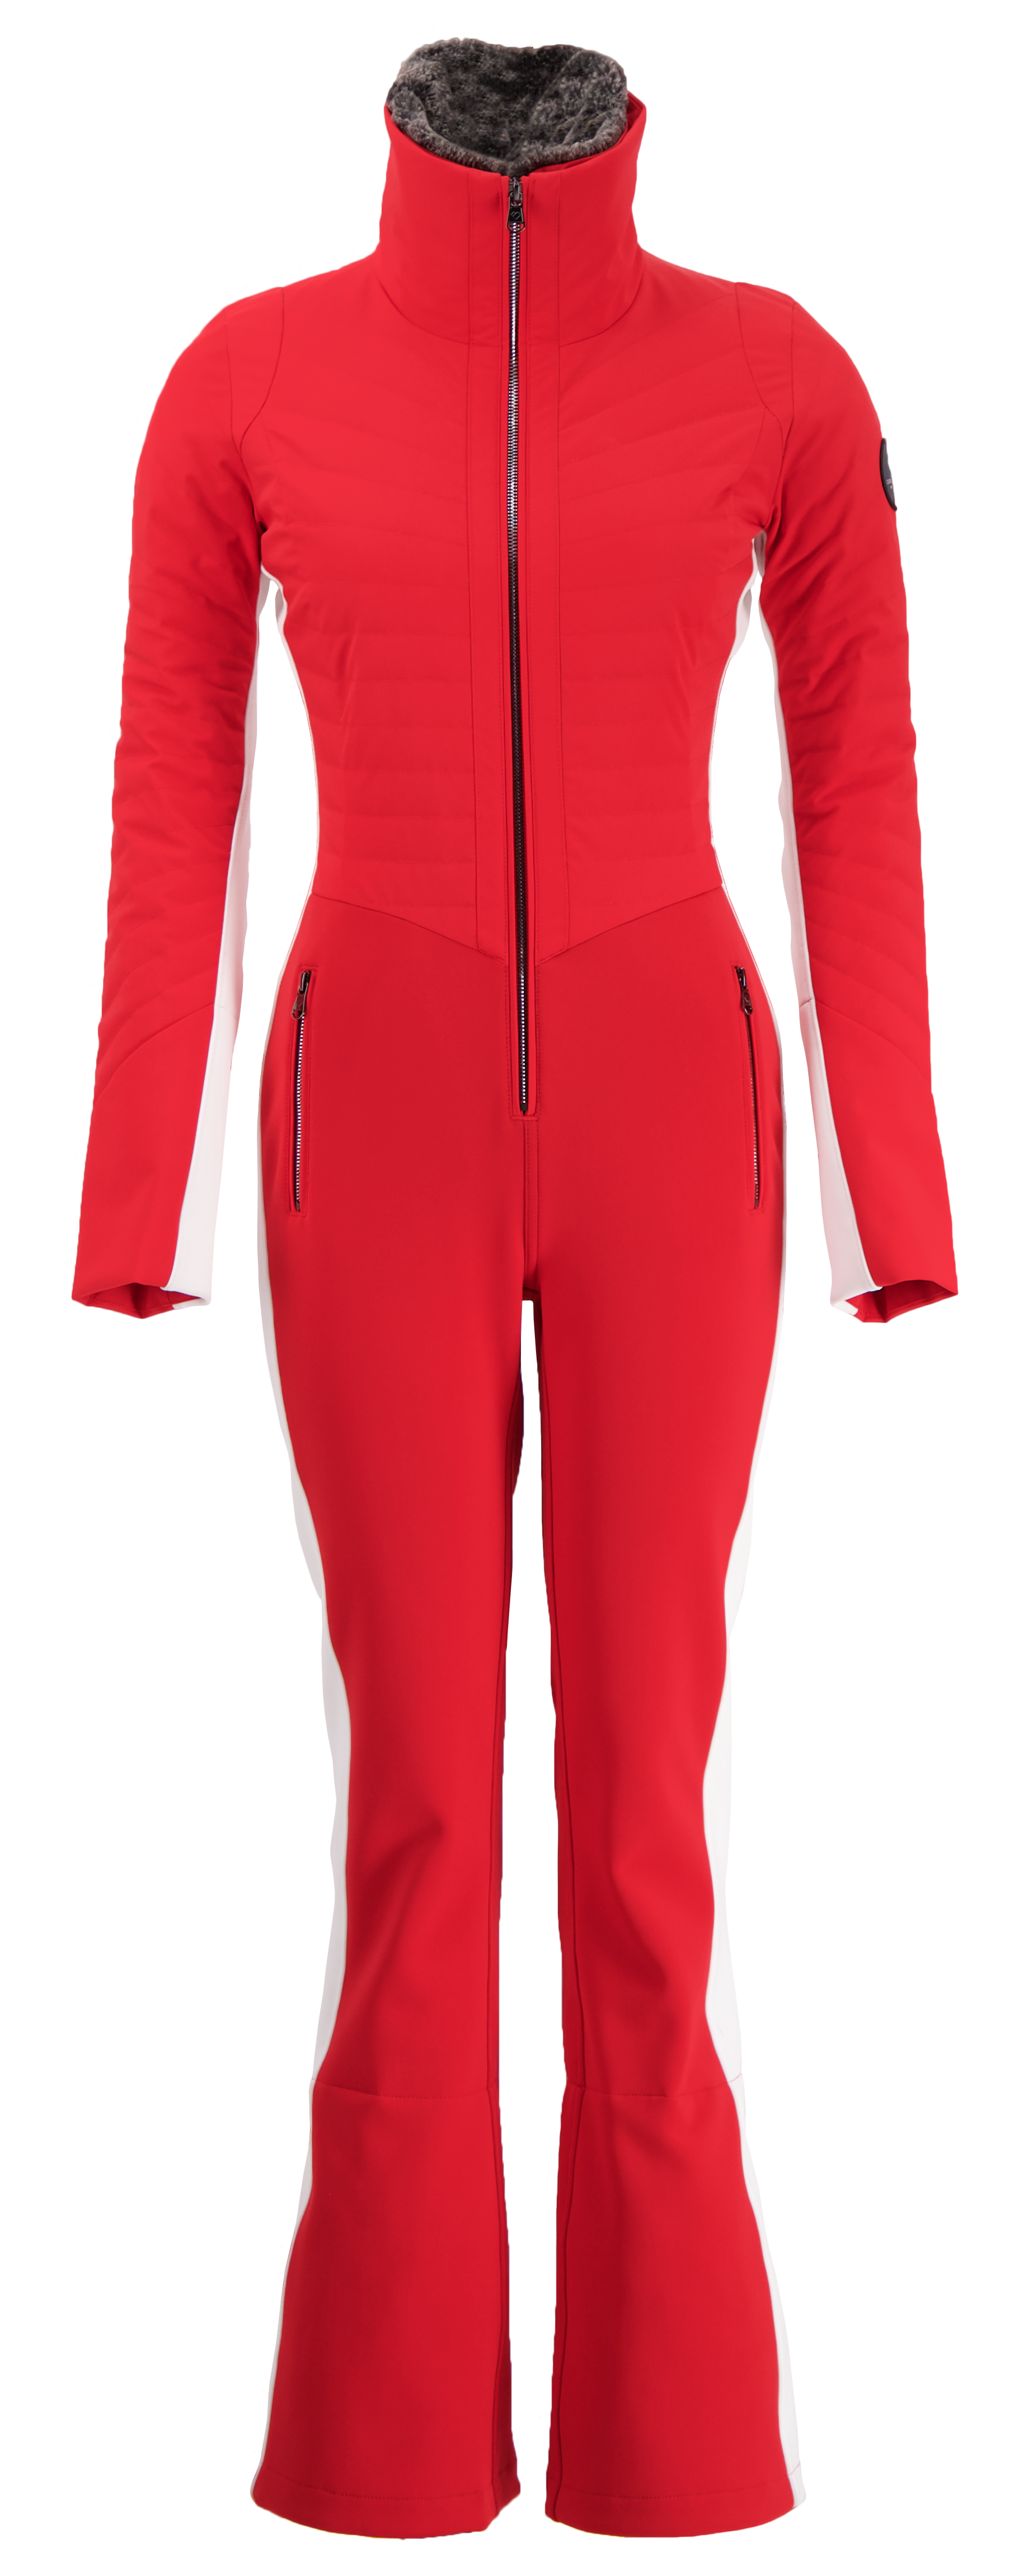 2016 Women's Nordica Santa Ana